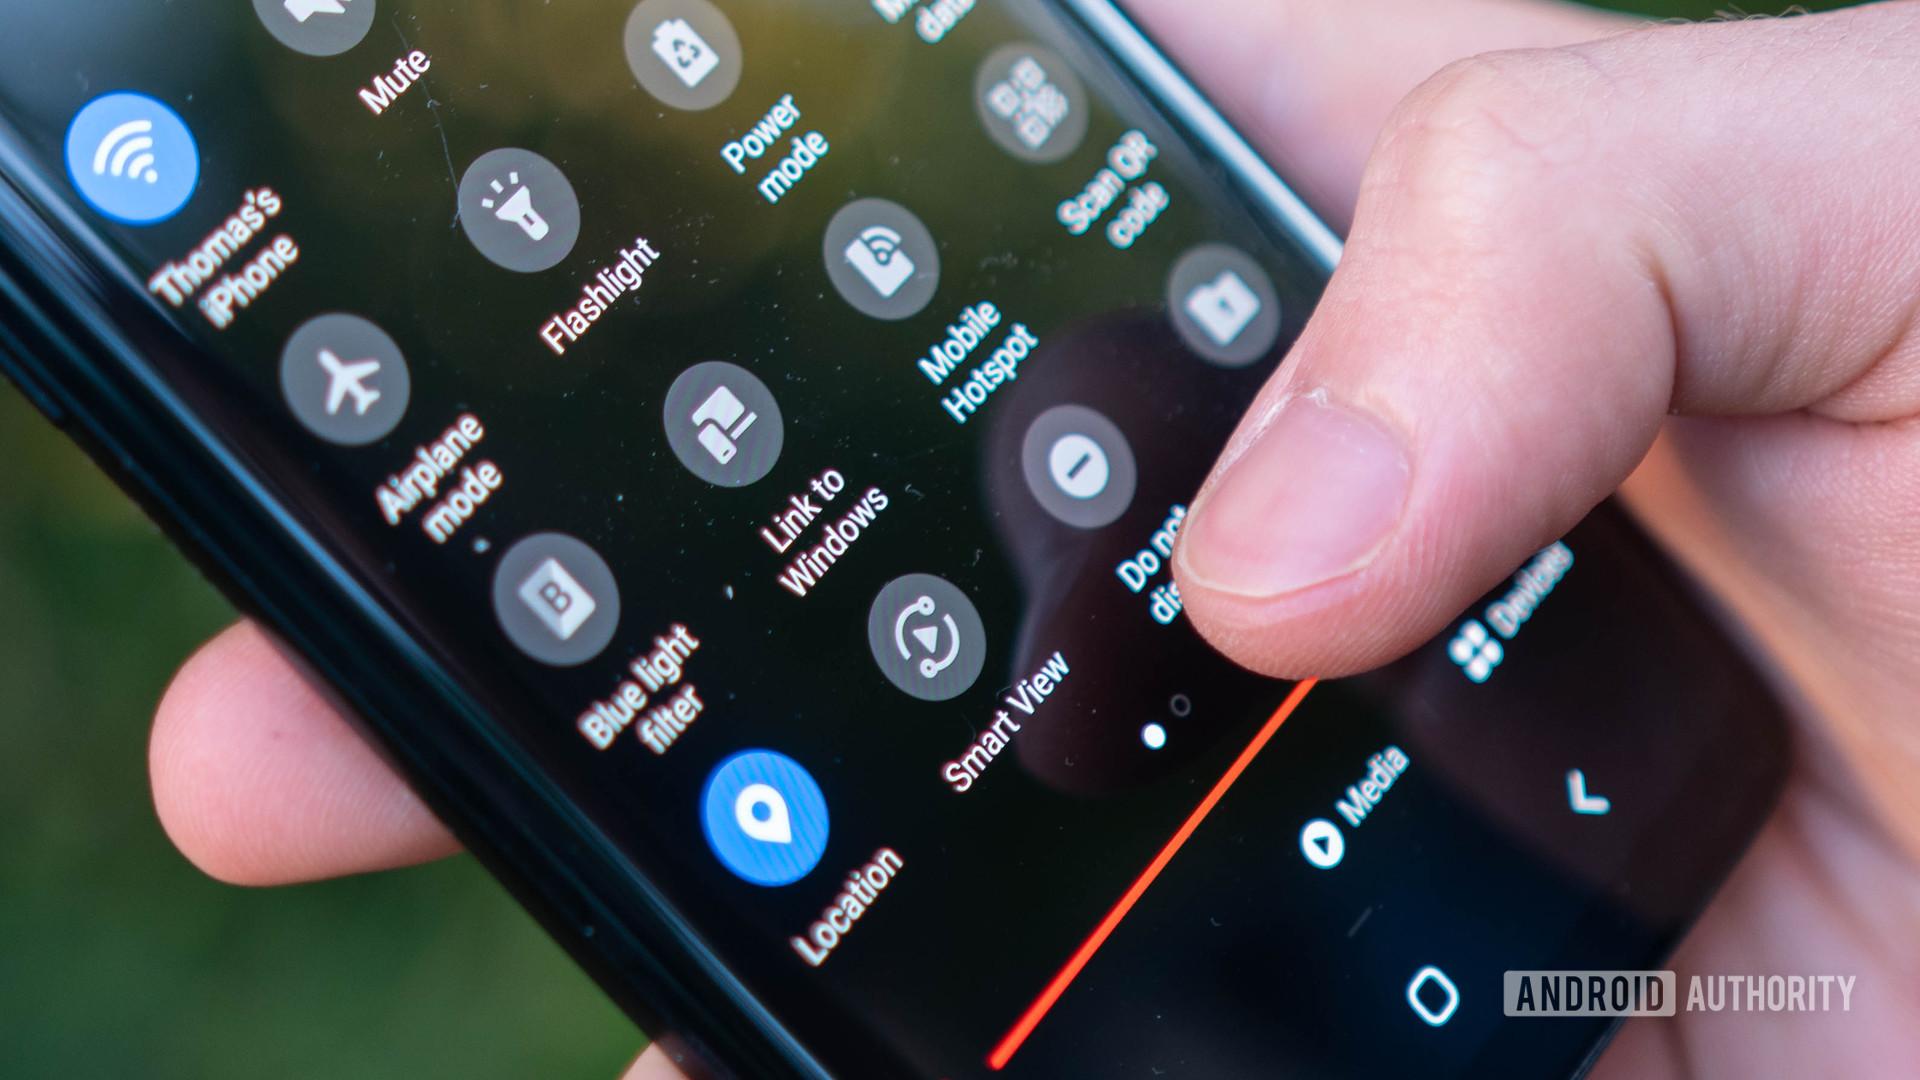 Galaxy S9 Plus Quick settings menu